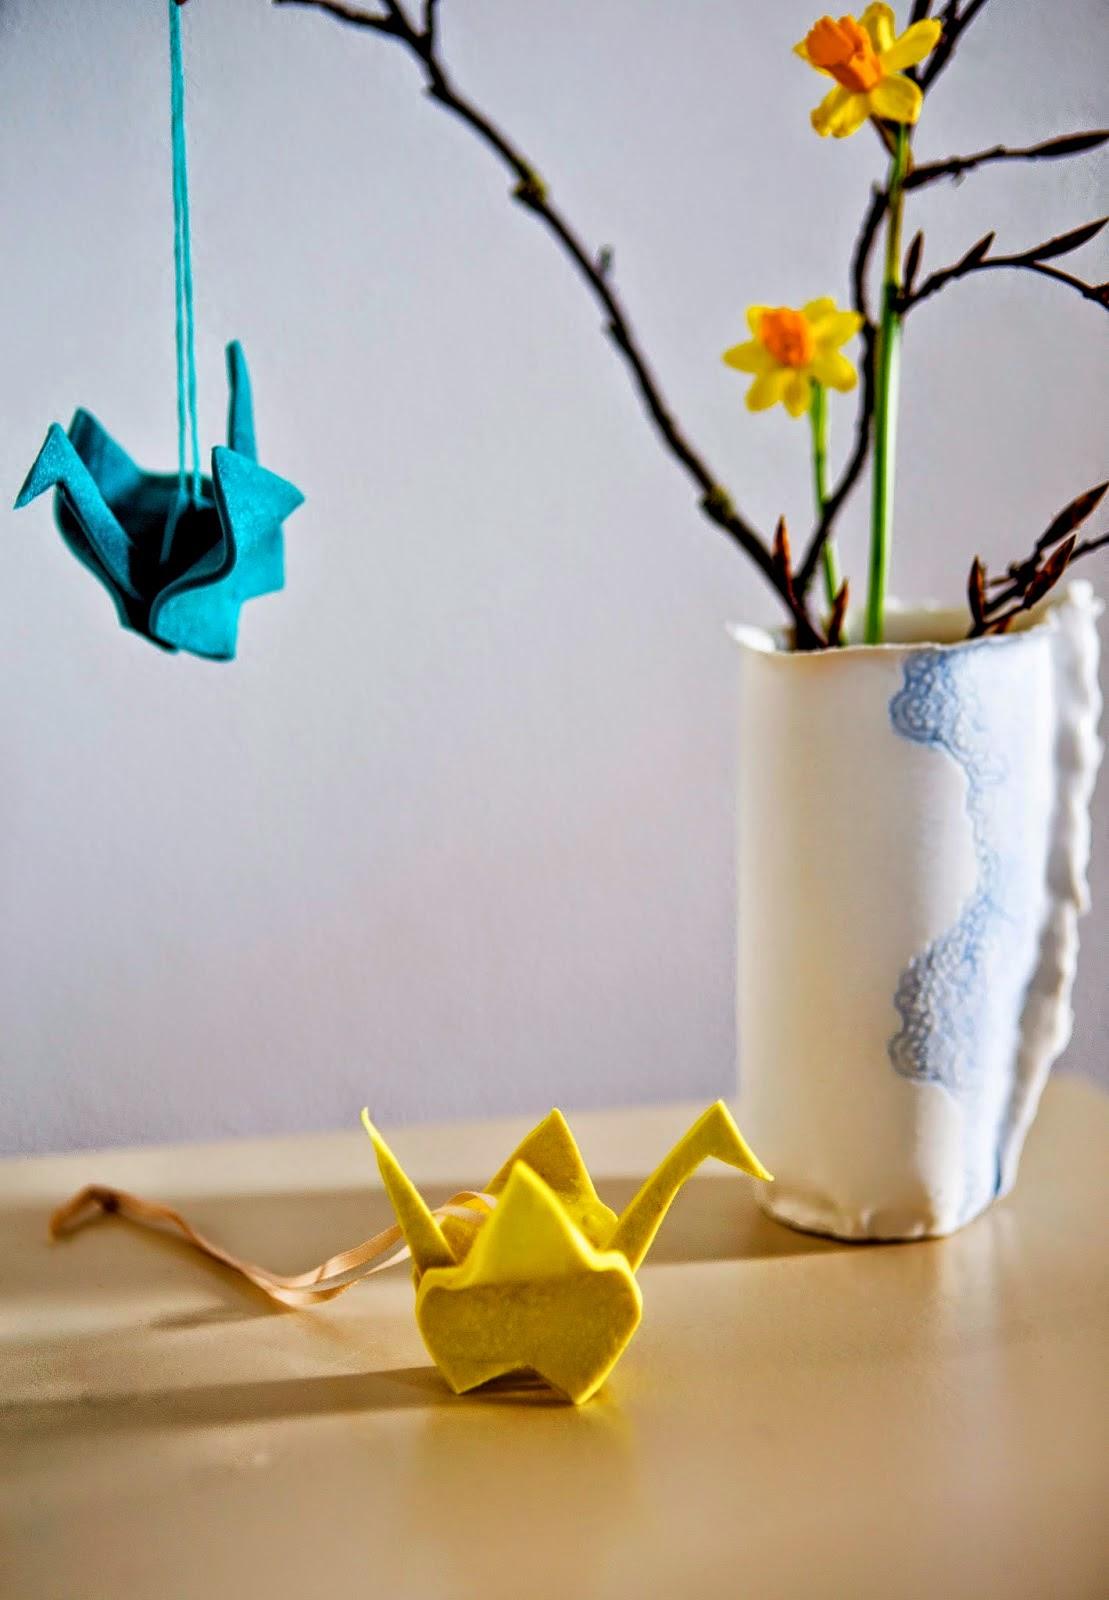 http://www.100decors.com/2014/04/diy-origami-bird.html